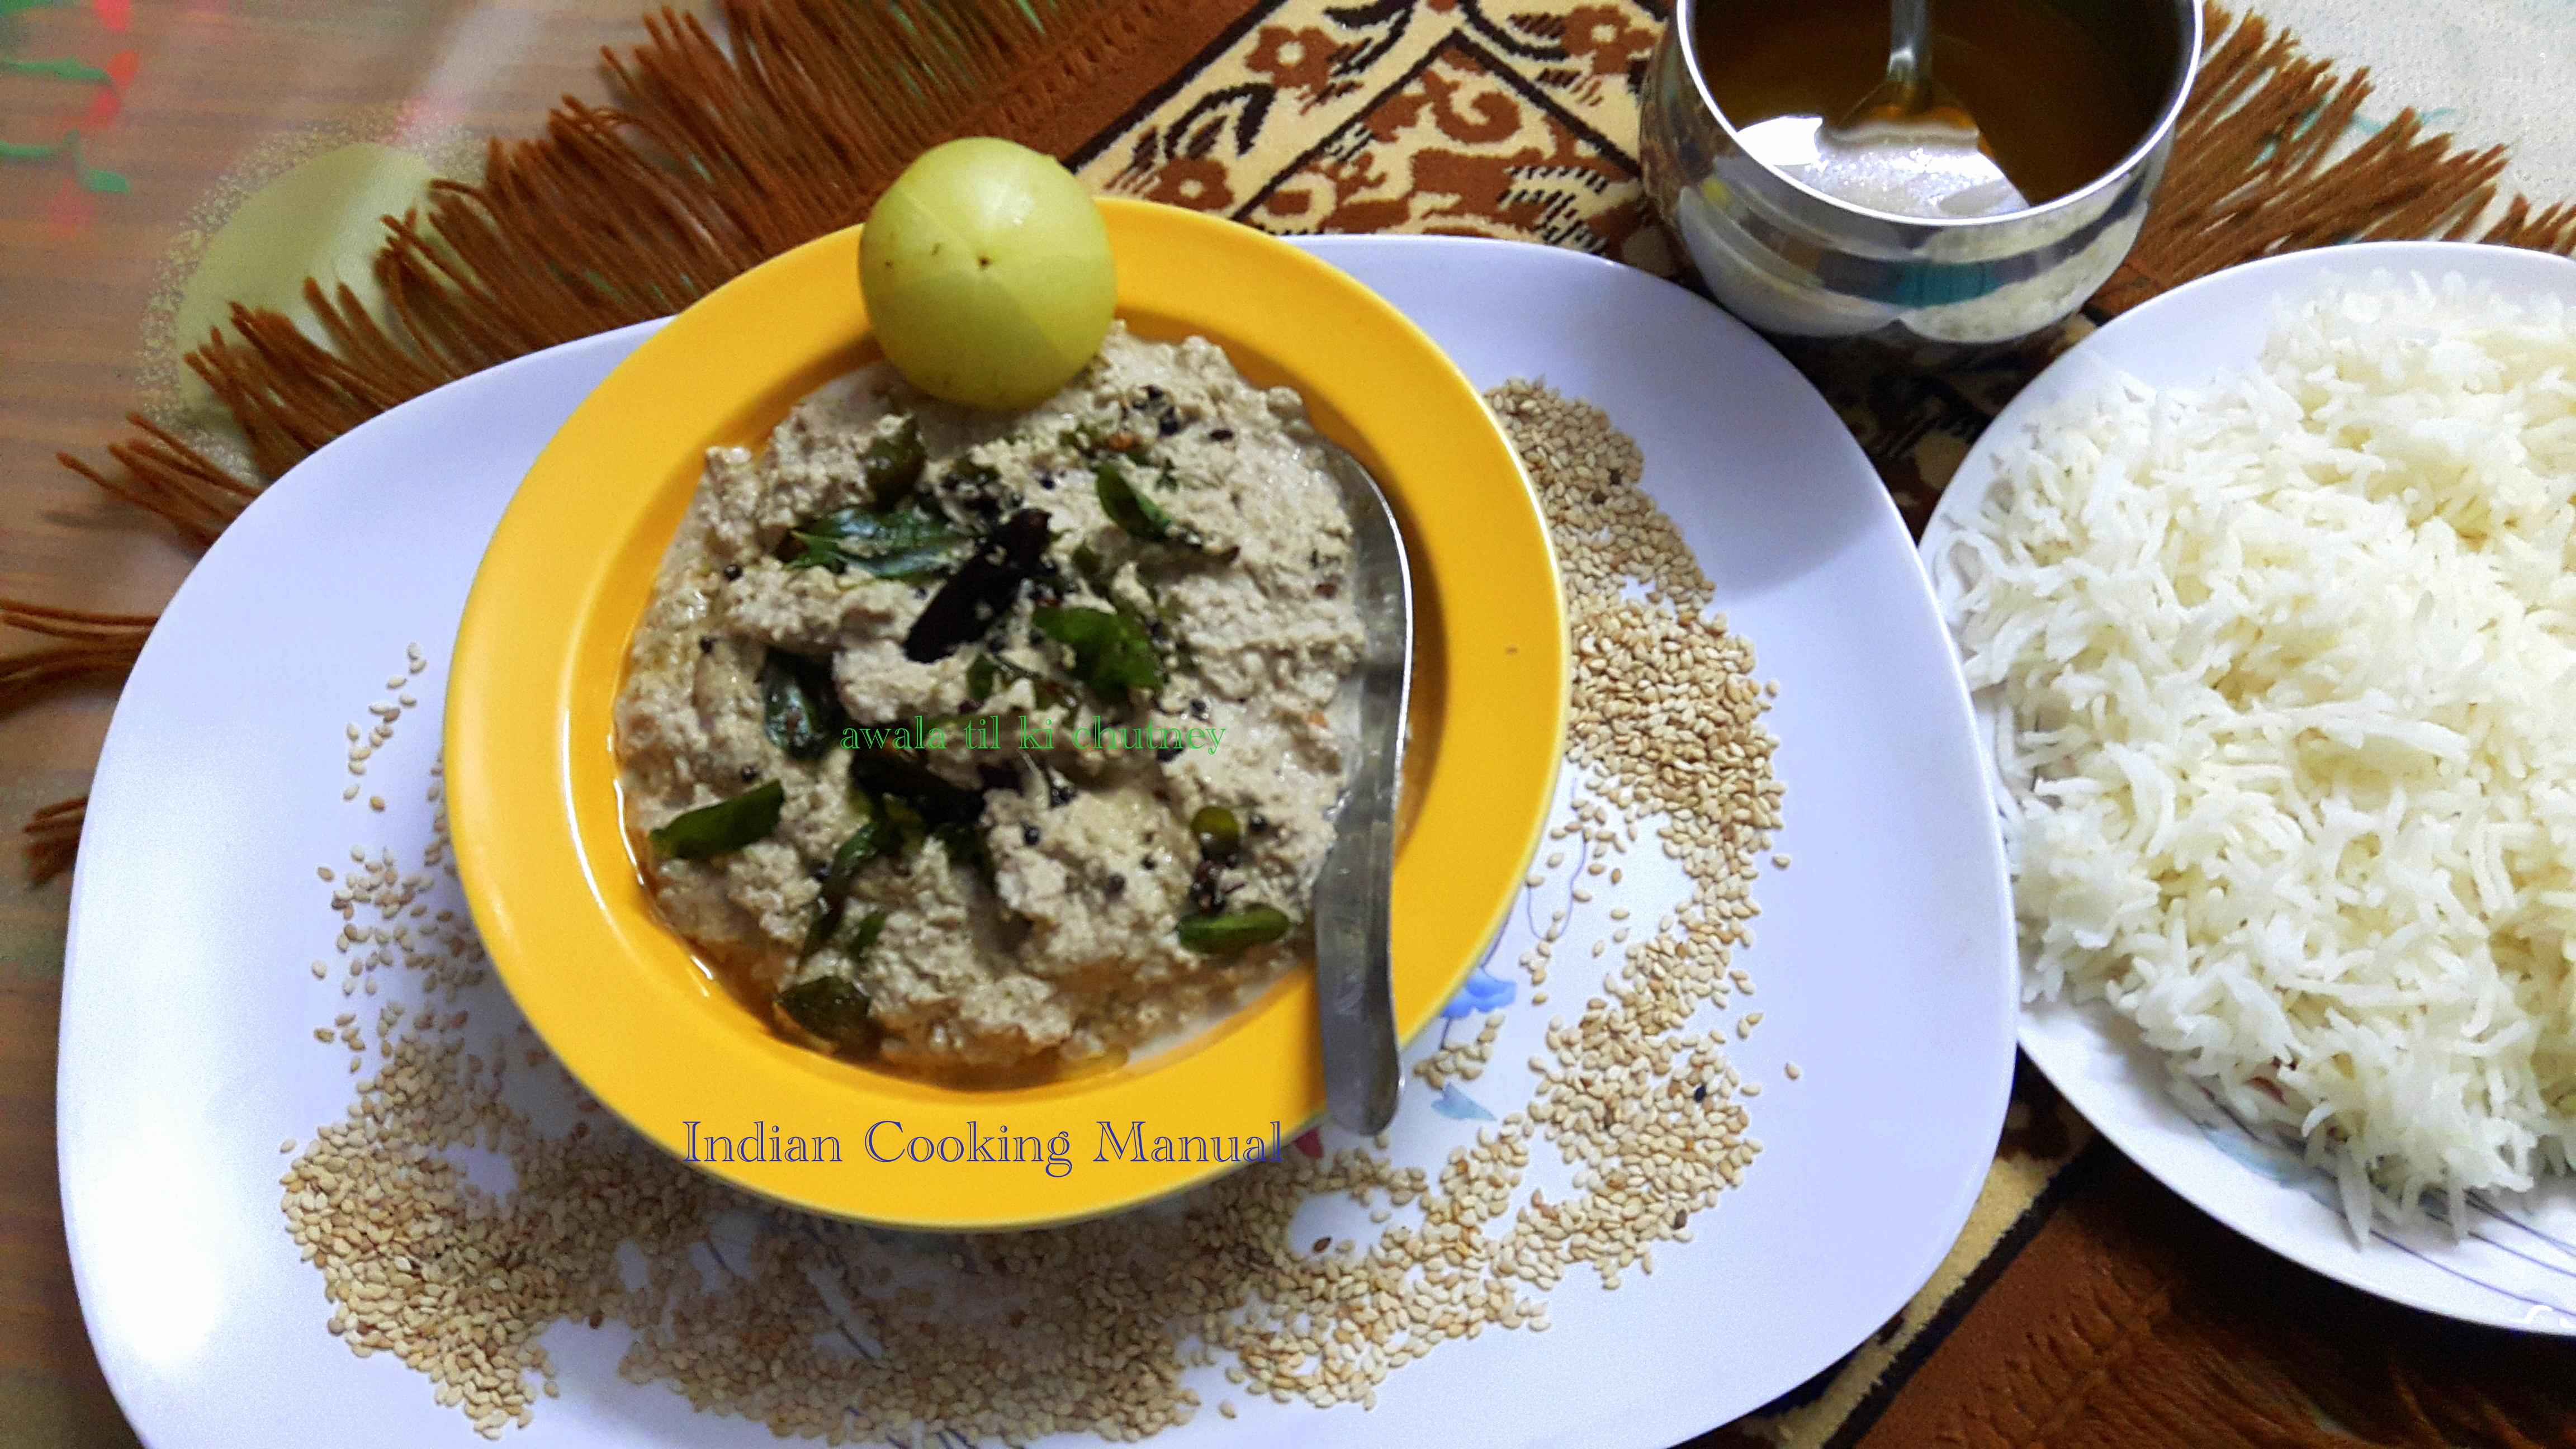 Amla-Til ki chutney (gooseberry and sesame seed chutney)